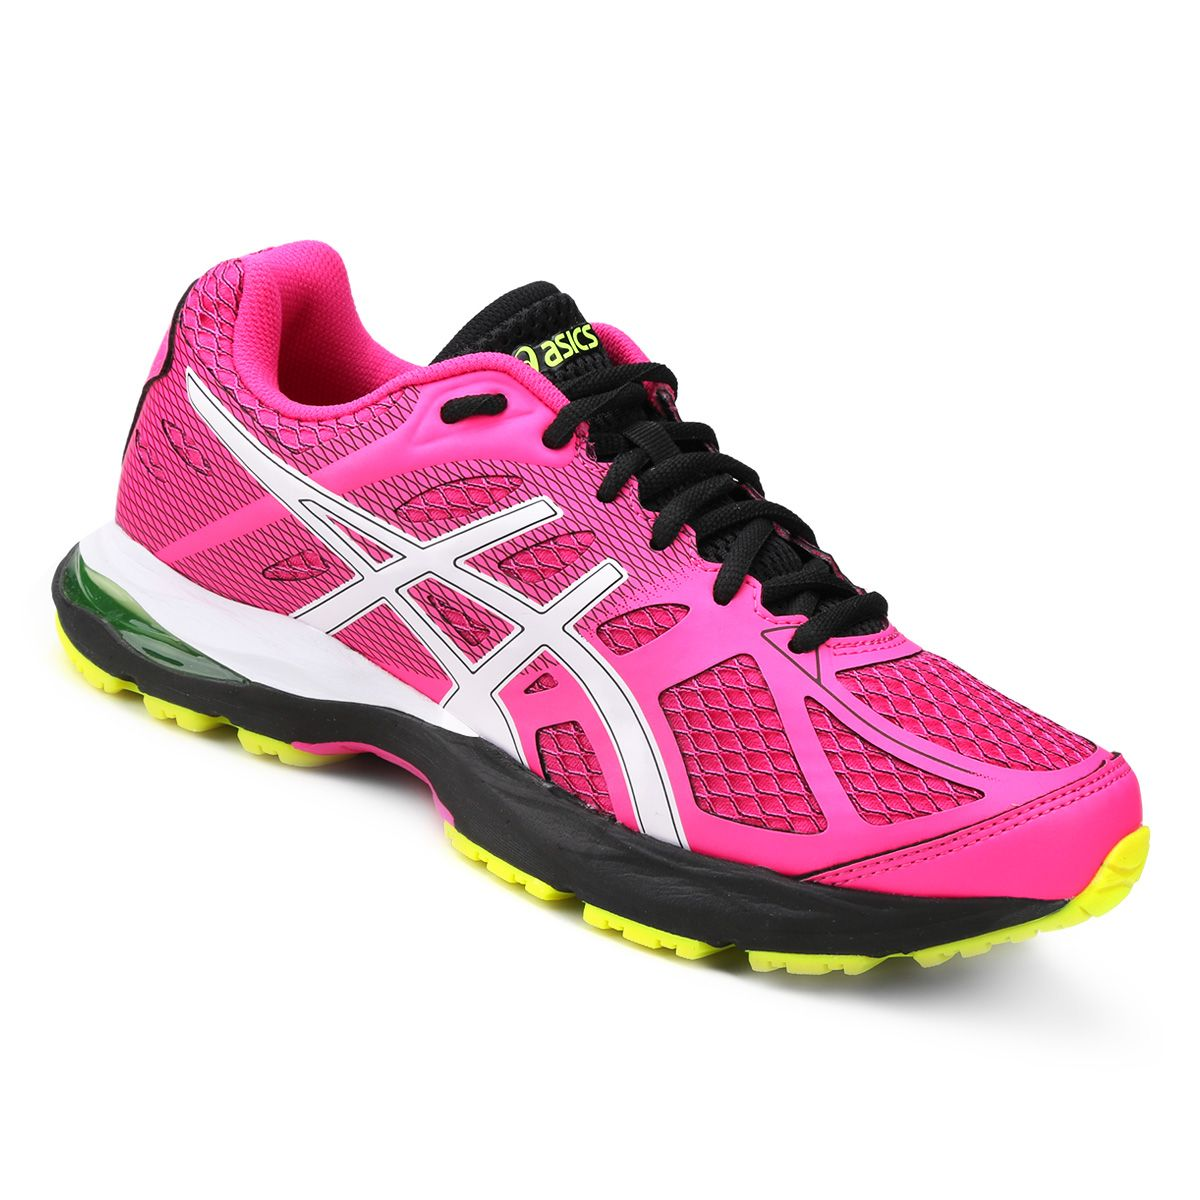 babab58f9c695 Tênis Asics Gel Spree Feminino - Pink e Branco